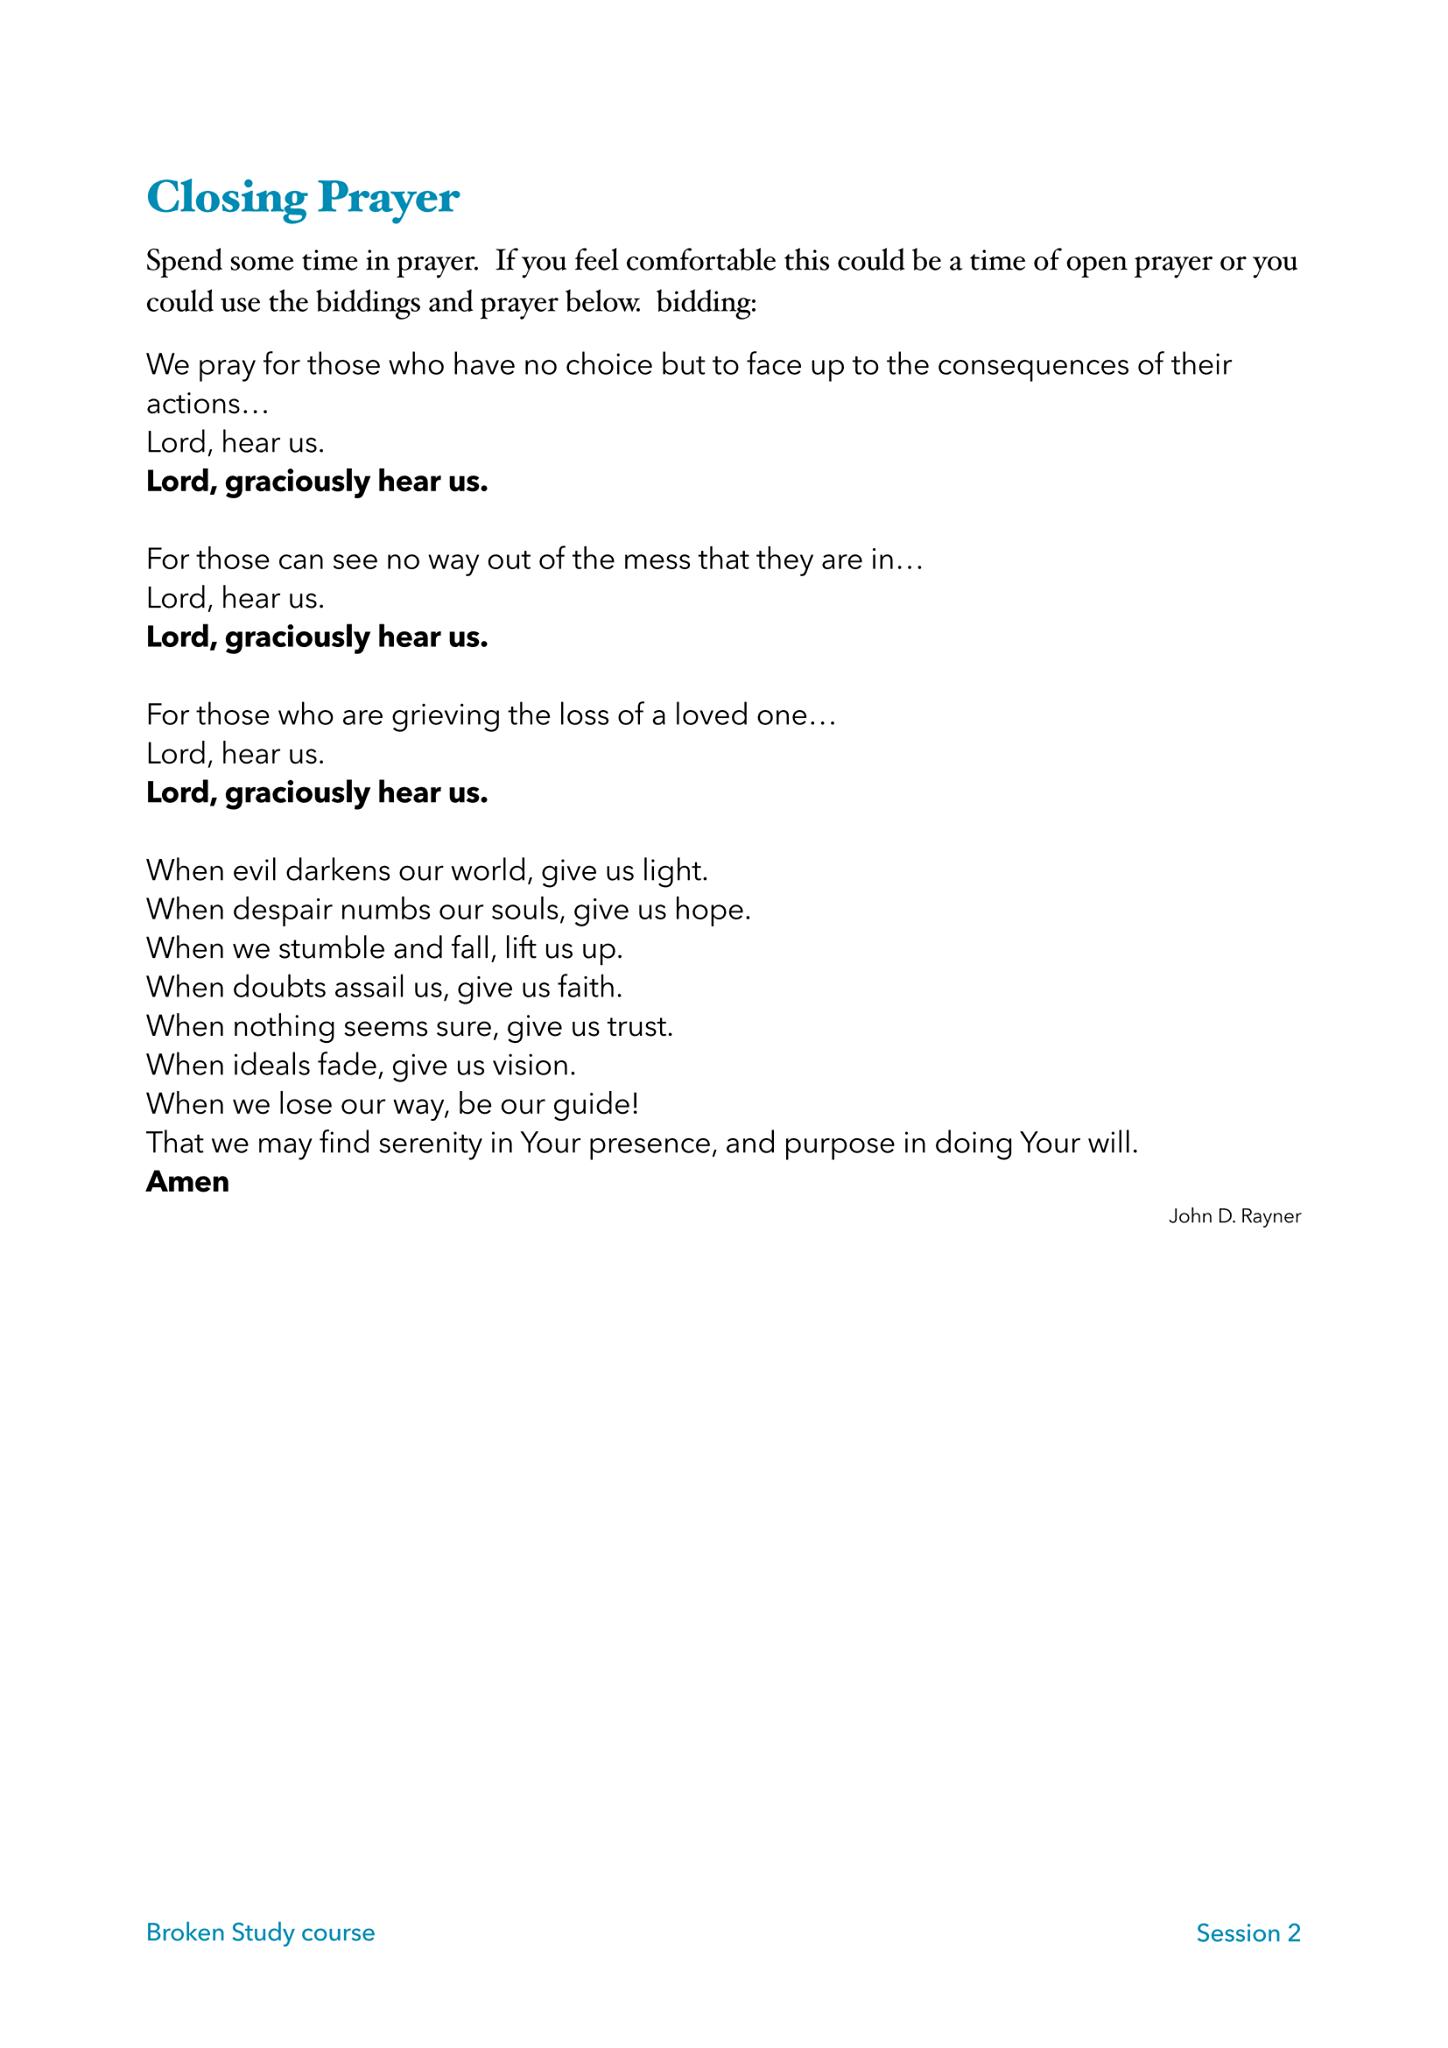 Broken Lent Course – Session 2 Worksheets – Roborough Team Ministry